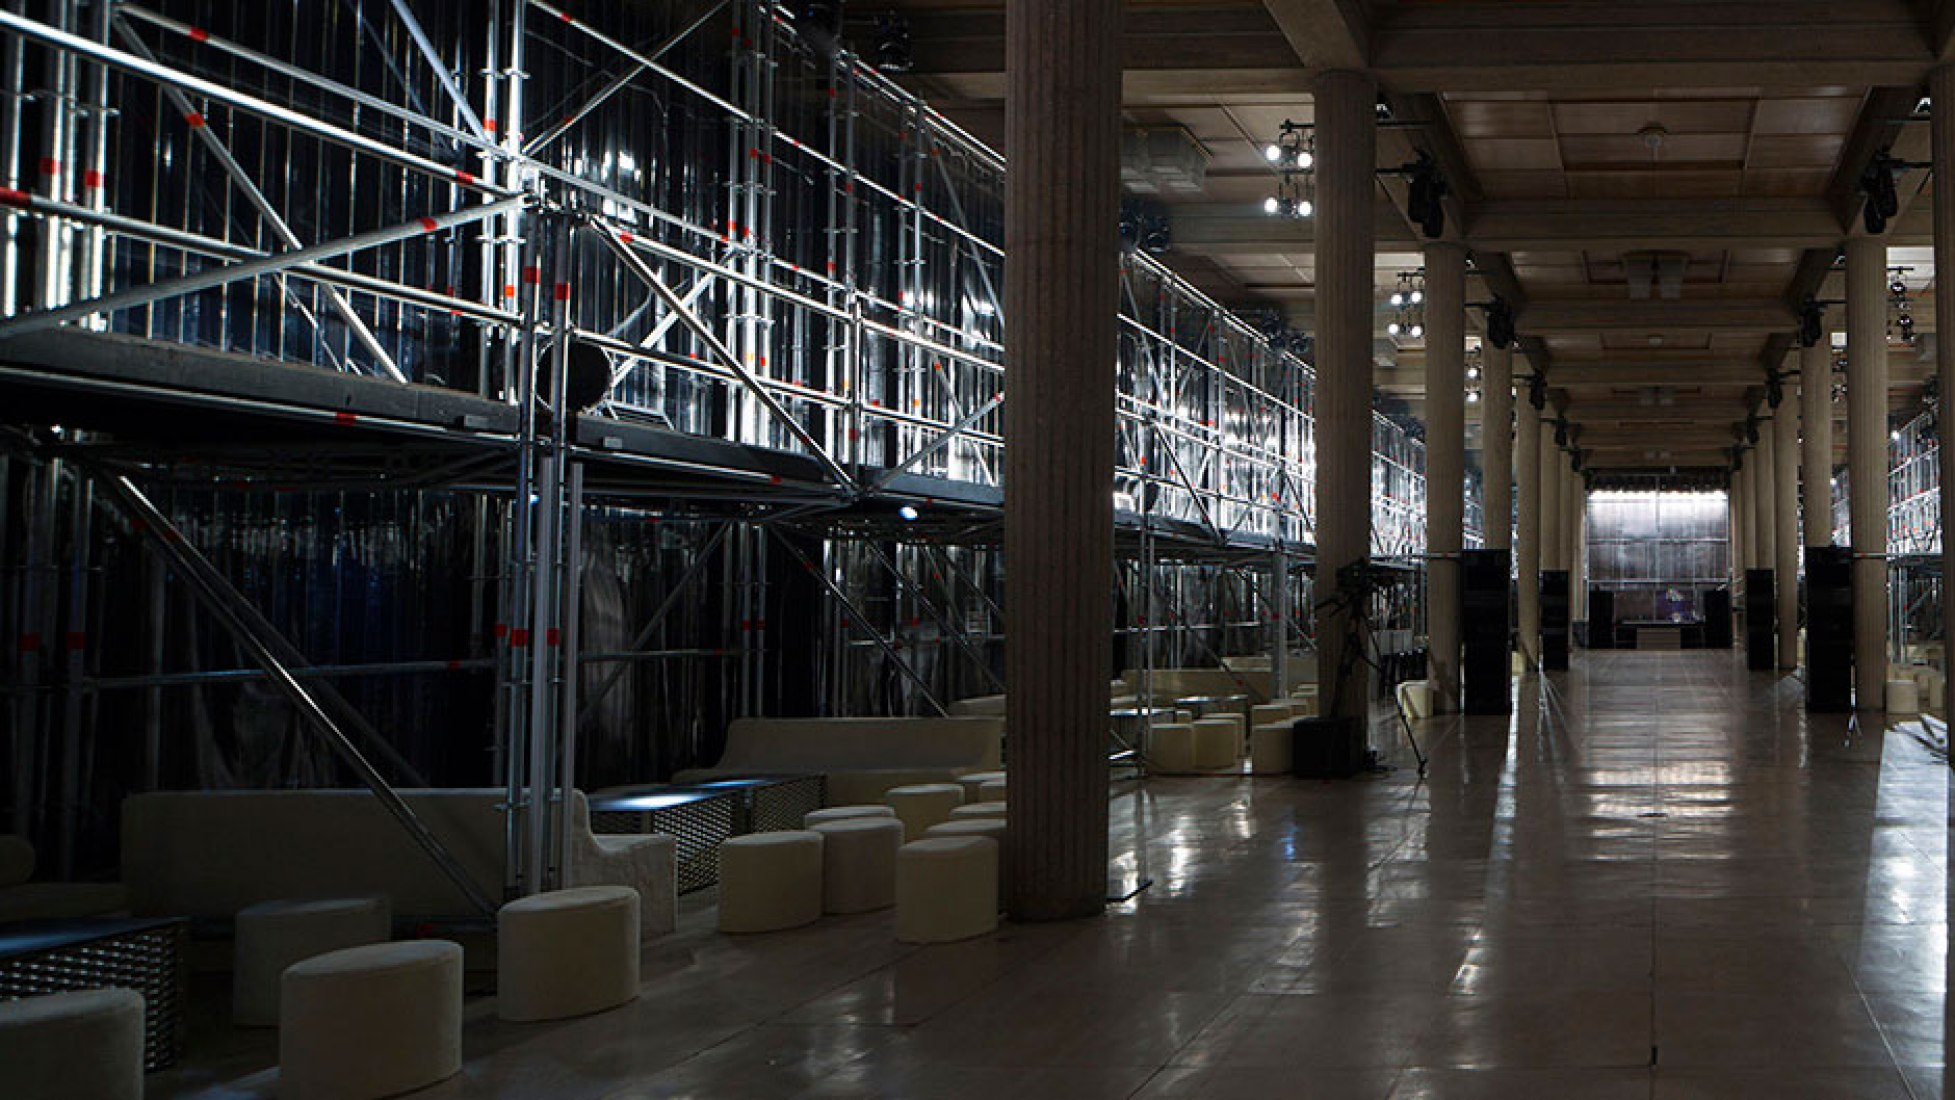 Interior view. MIU MIU club by Prada and AMO. Photograph © Agostino Osio and Alberto Moncada. Courtesy of OMA.